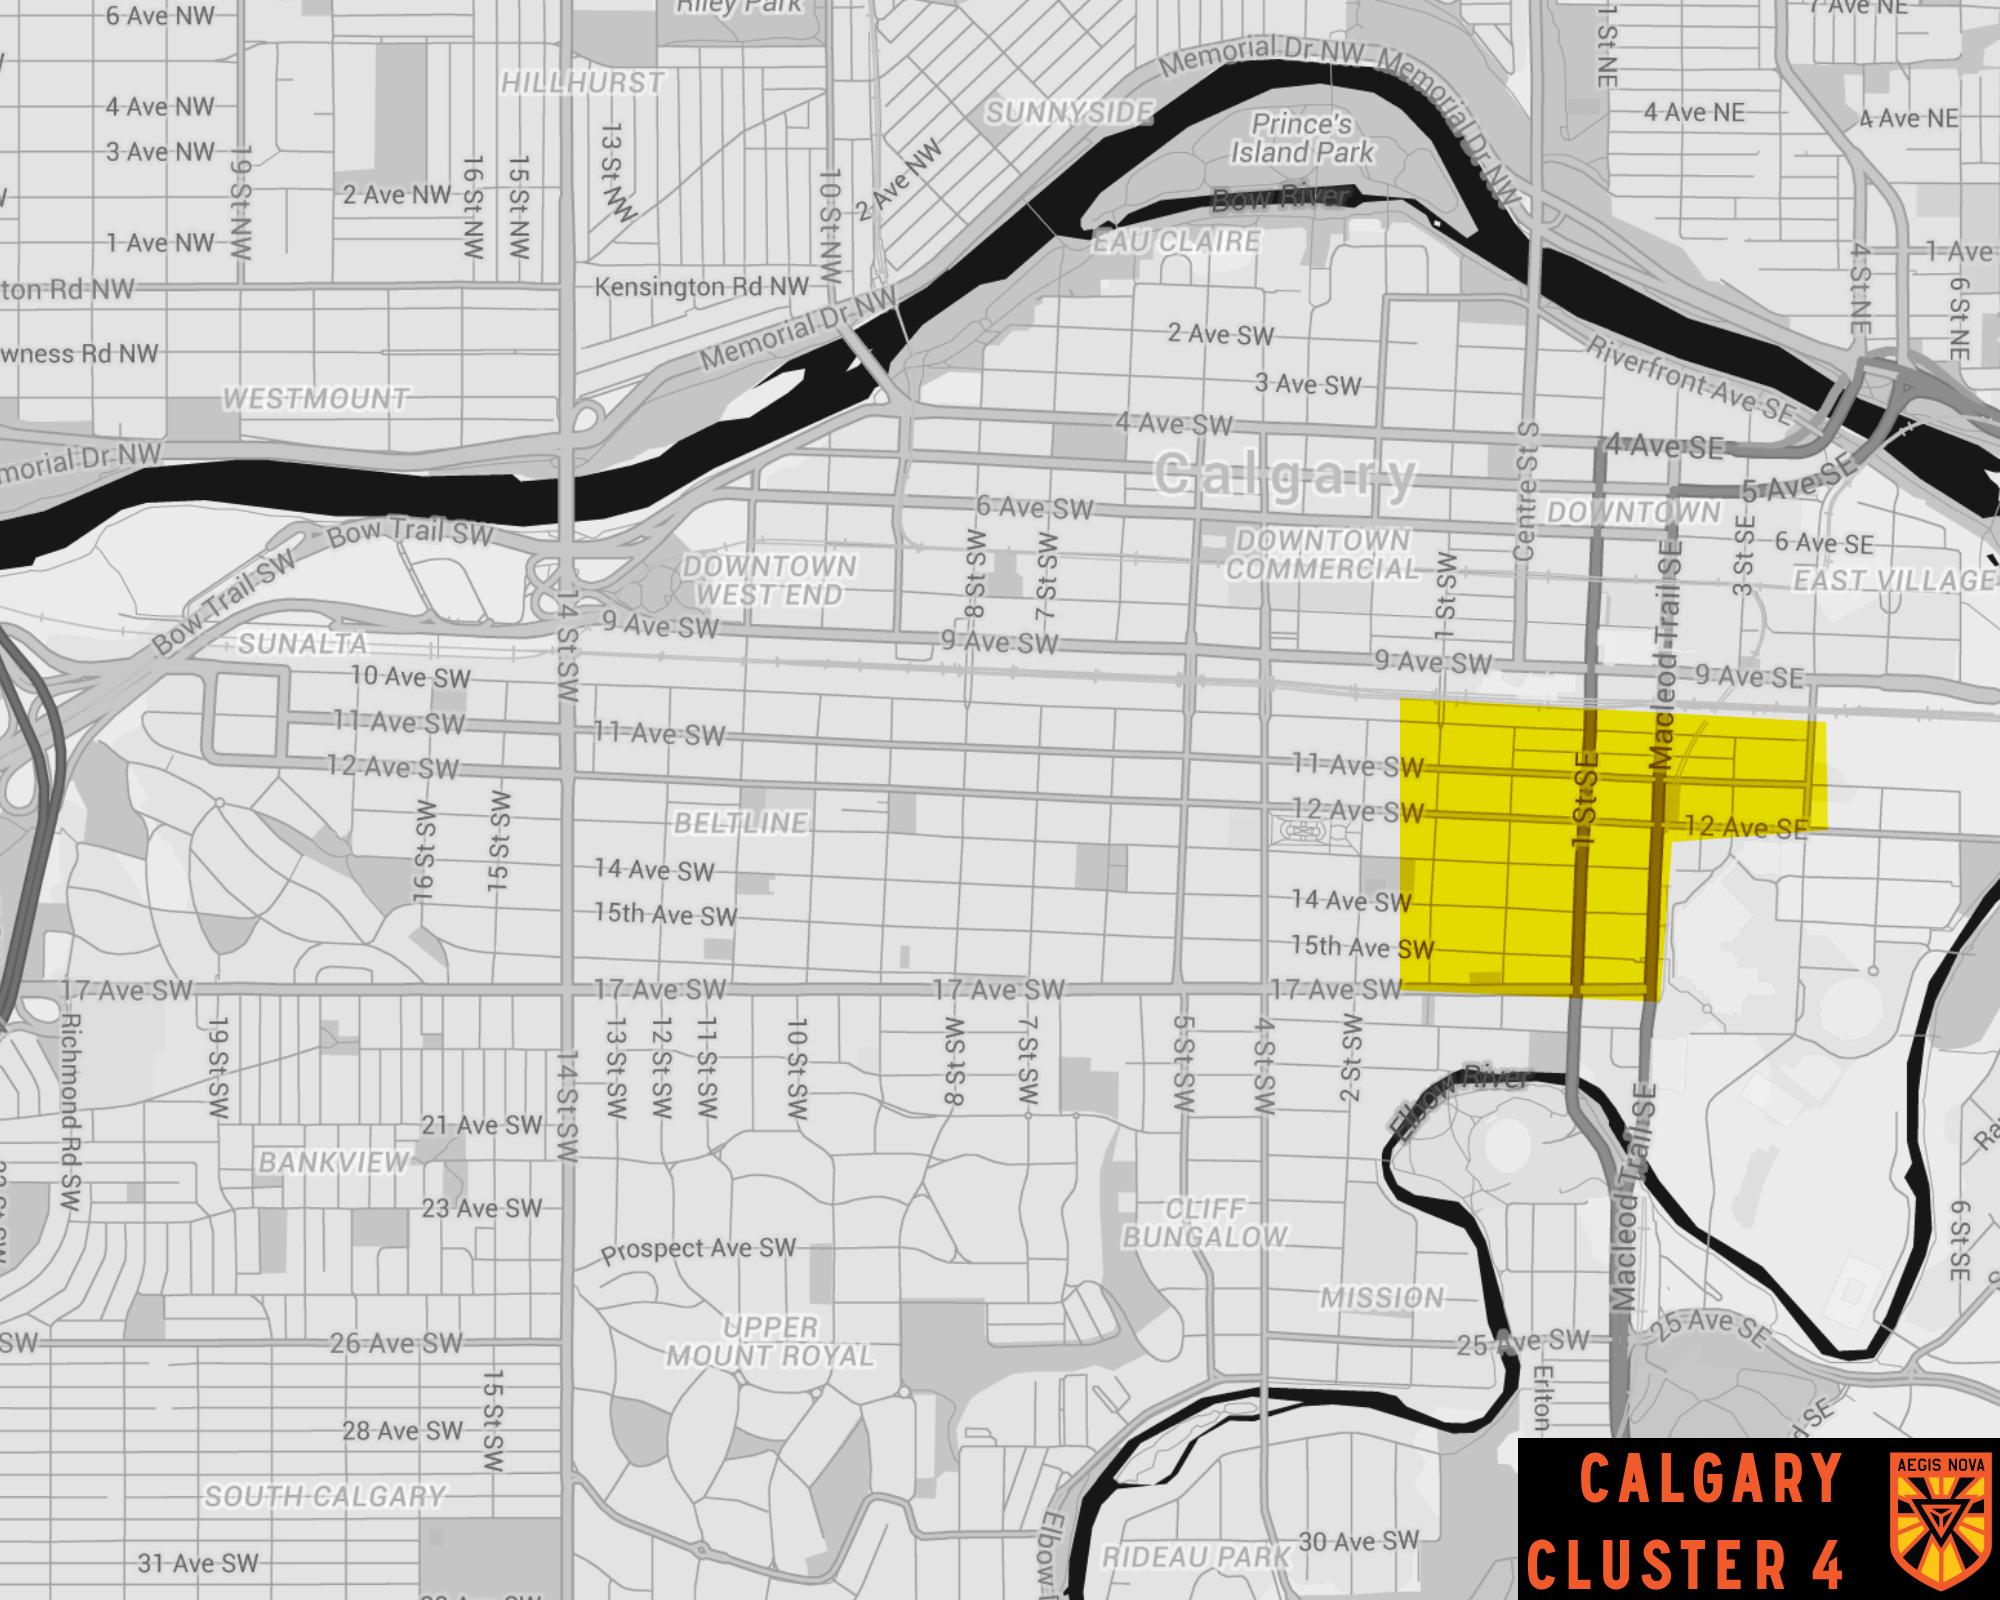 CalgaryCluster4.png